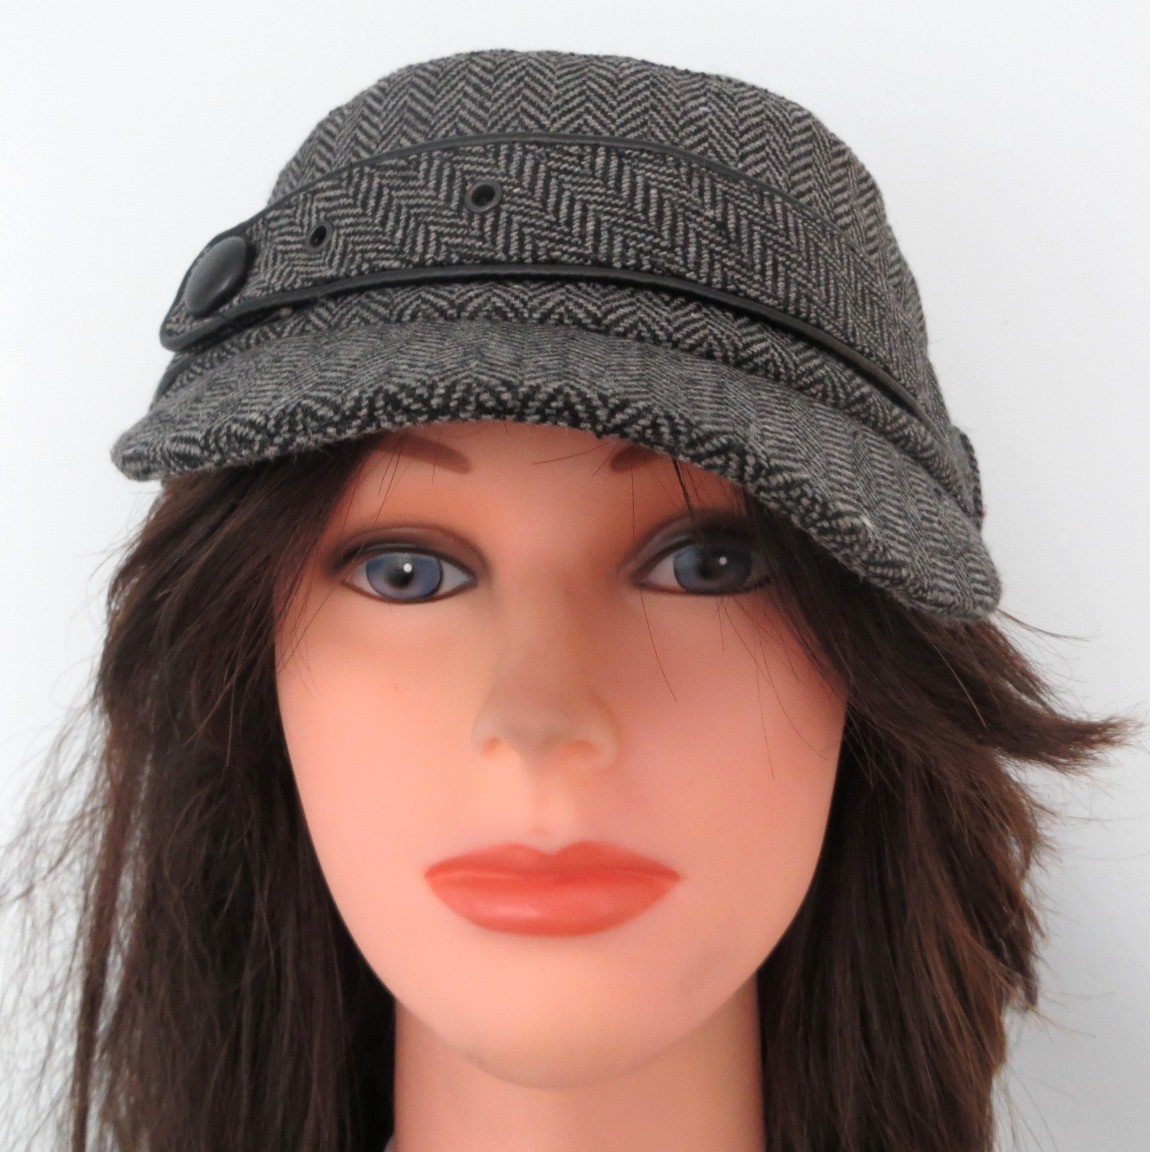 Gray herringbone cap with belt